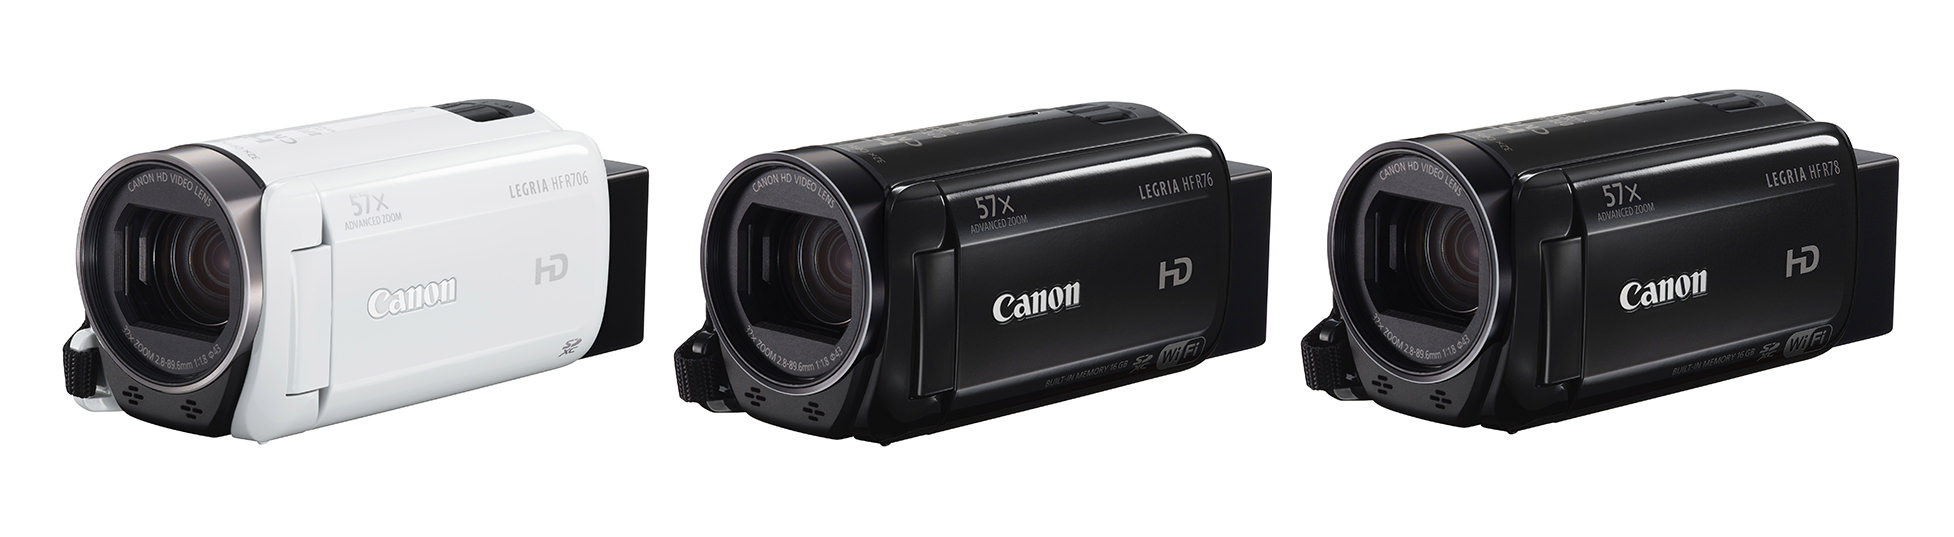 Canon Legria Serie HF R